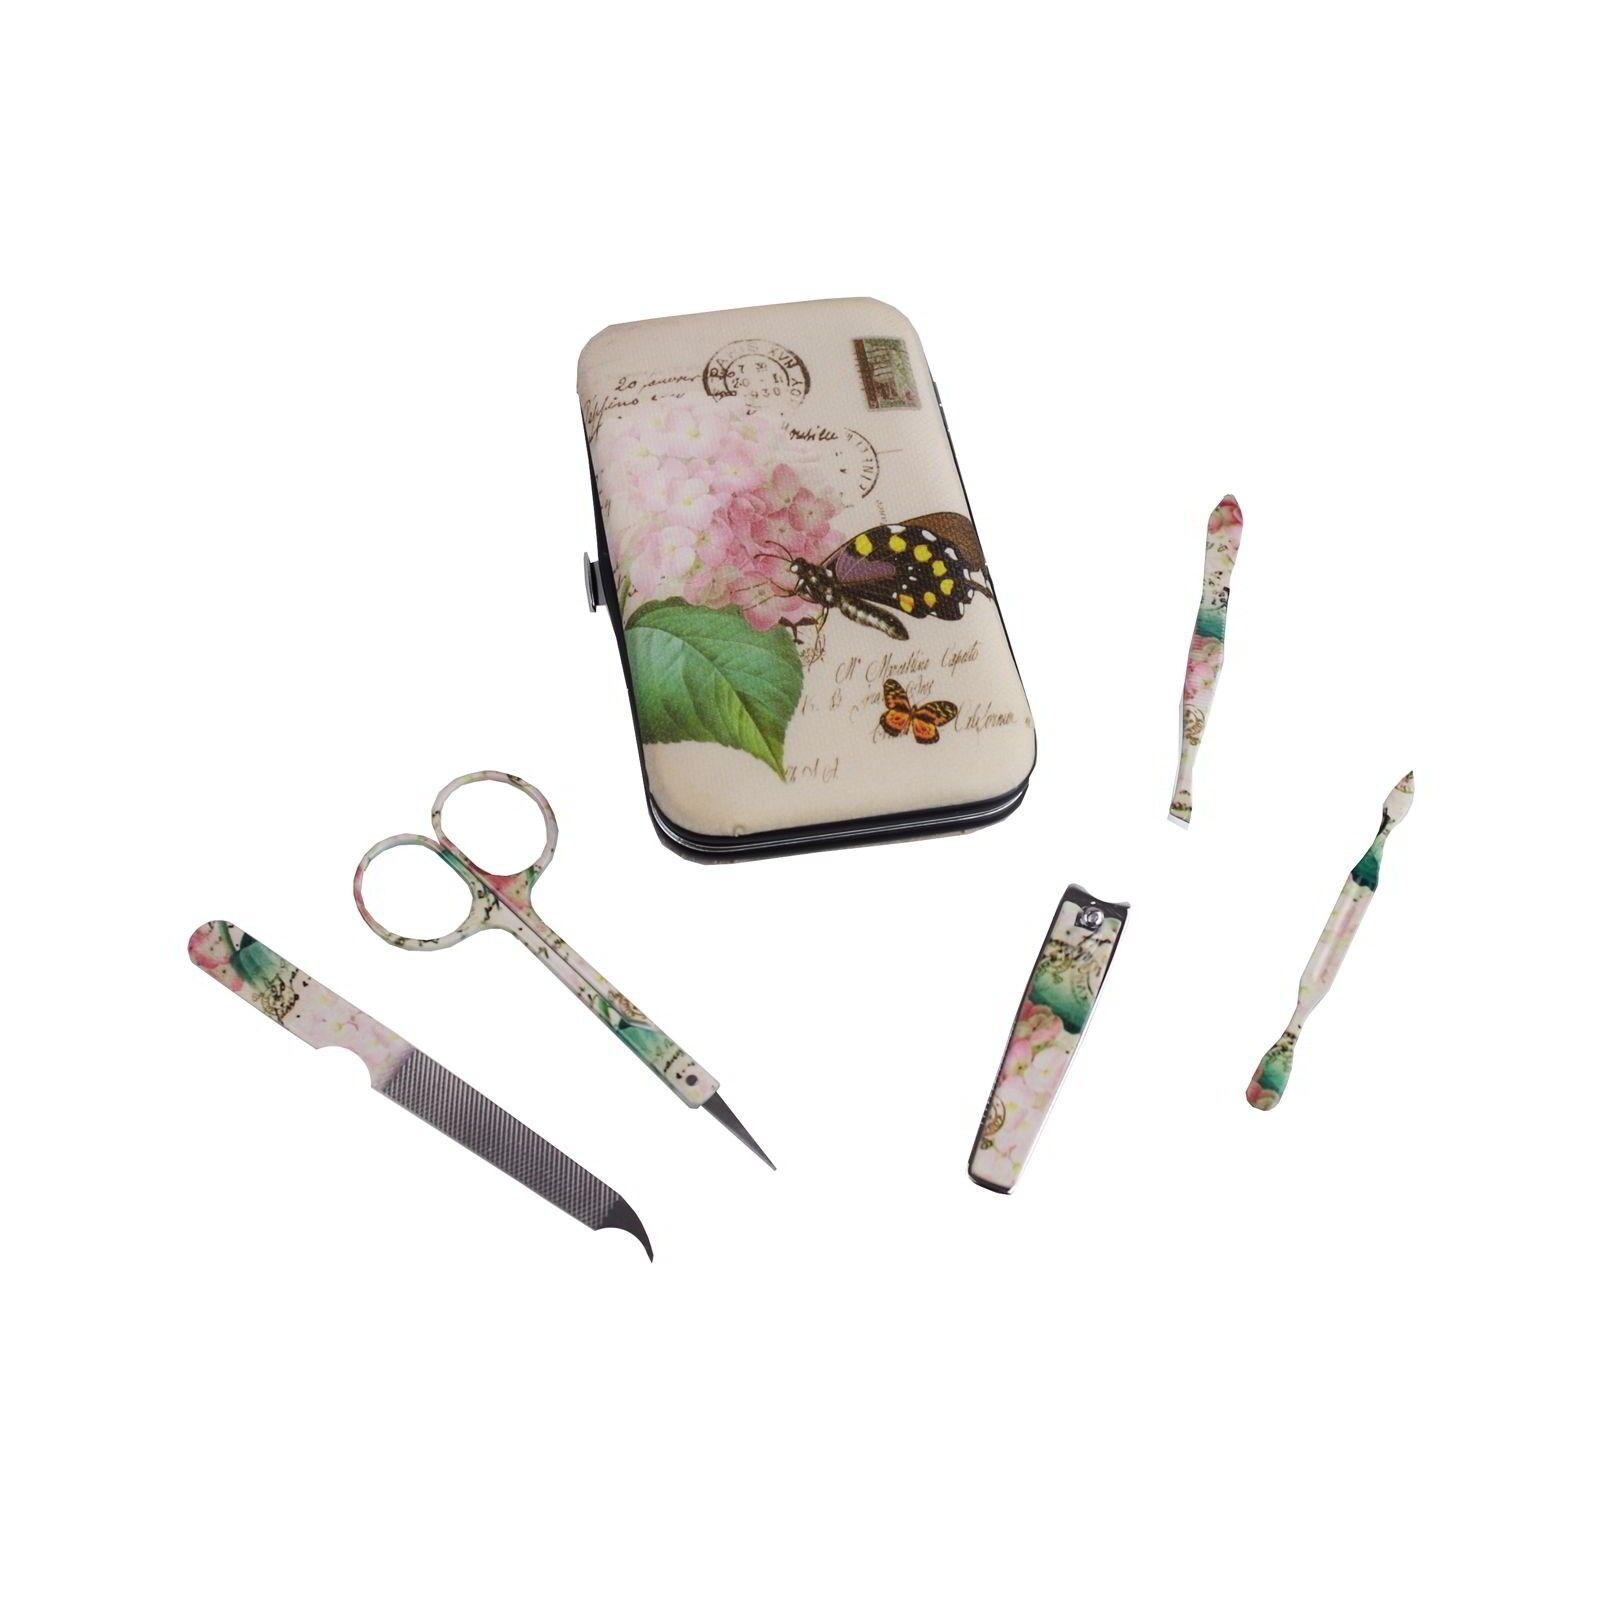 Maniküre-Set Retrodesign 6tlg. Nägel Beauty Beautyprodukt Pflegeprodukt Maniküre